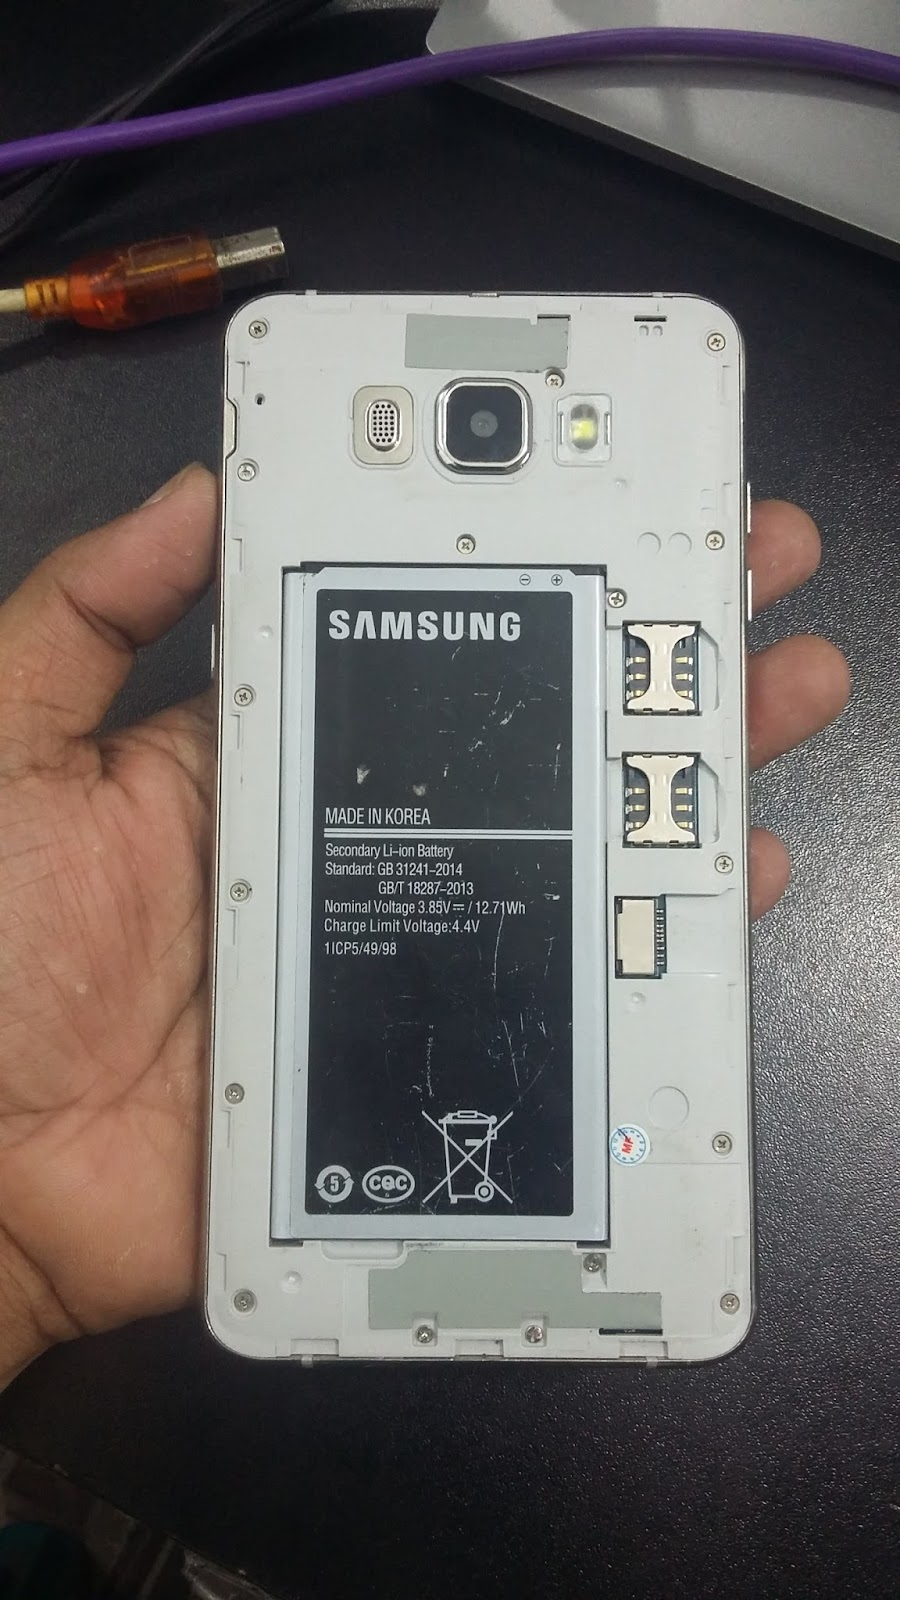 MT6572__Samsung__SM-J800FN - أكاديمية ملوك تيم